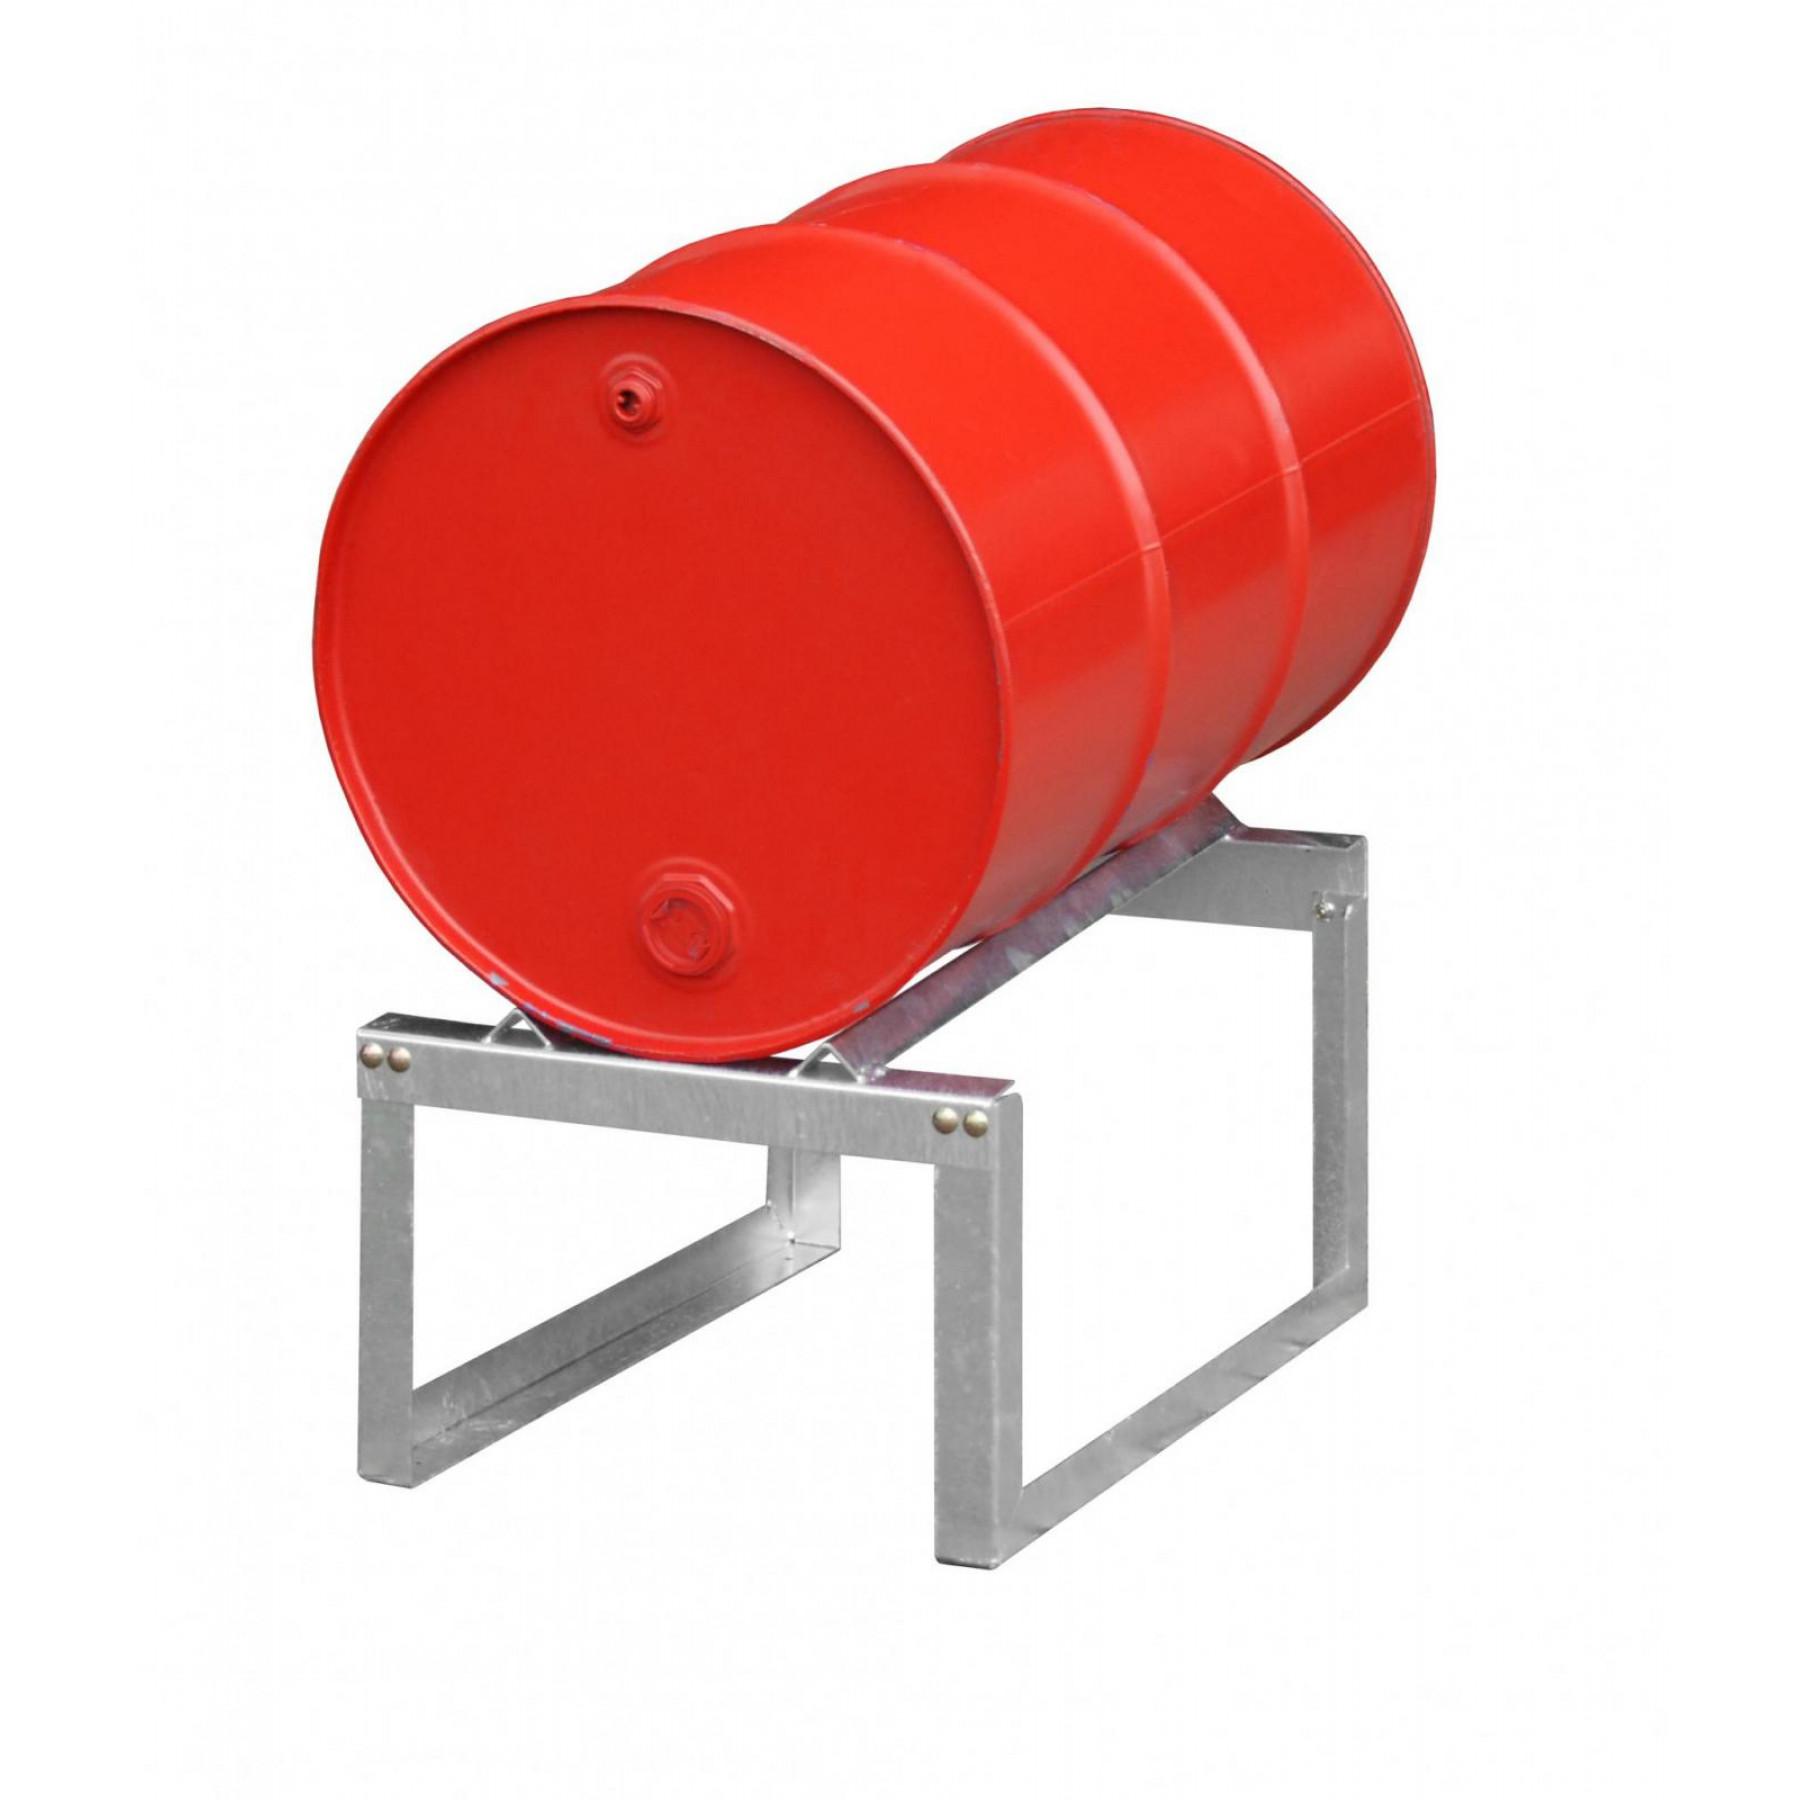 Vatenrek t.b.v. 1 x 200 liter vat, verzinkt, 70049-FA200-1